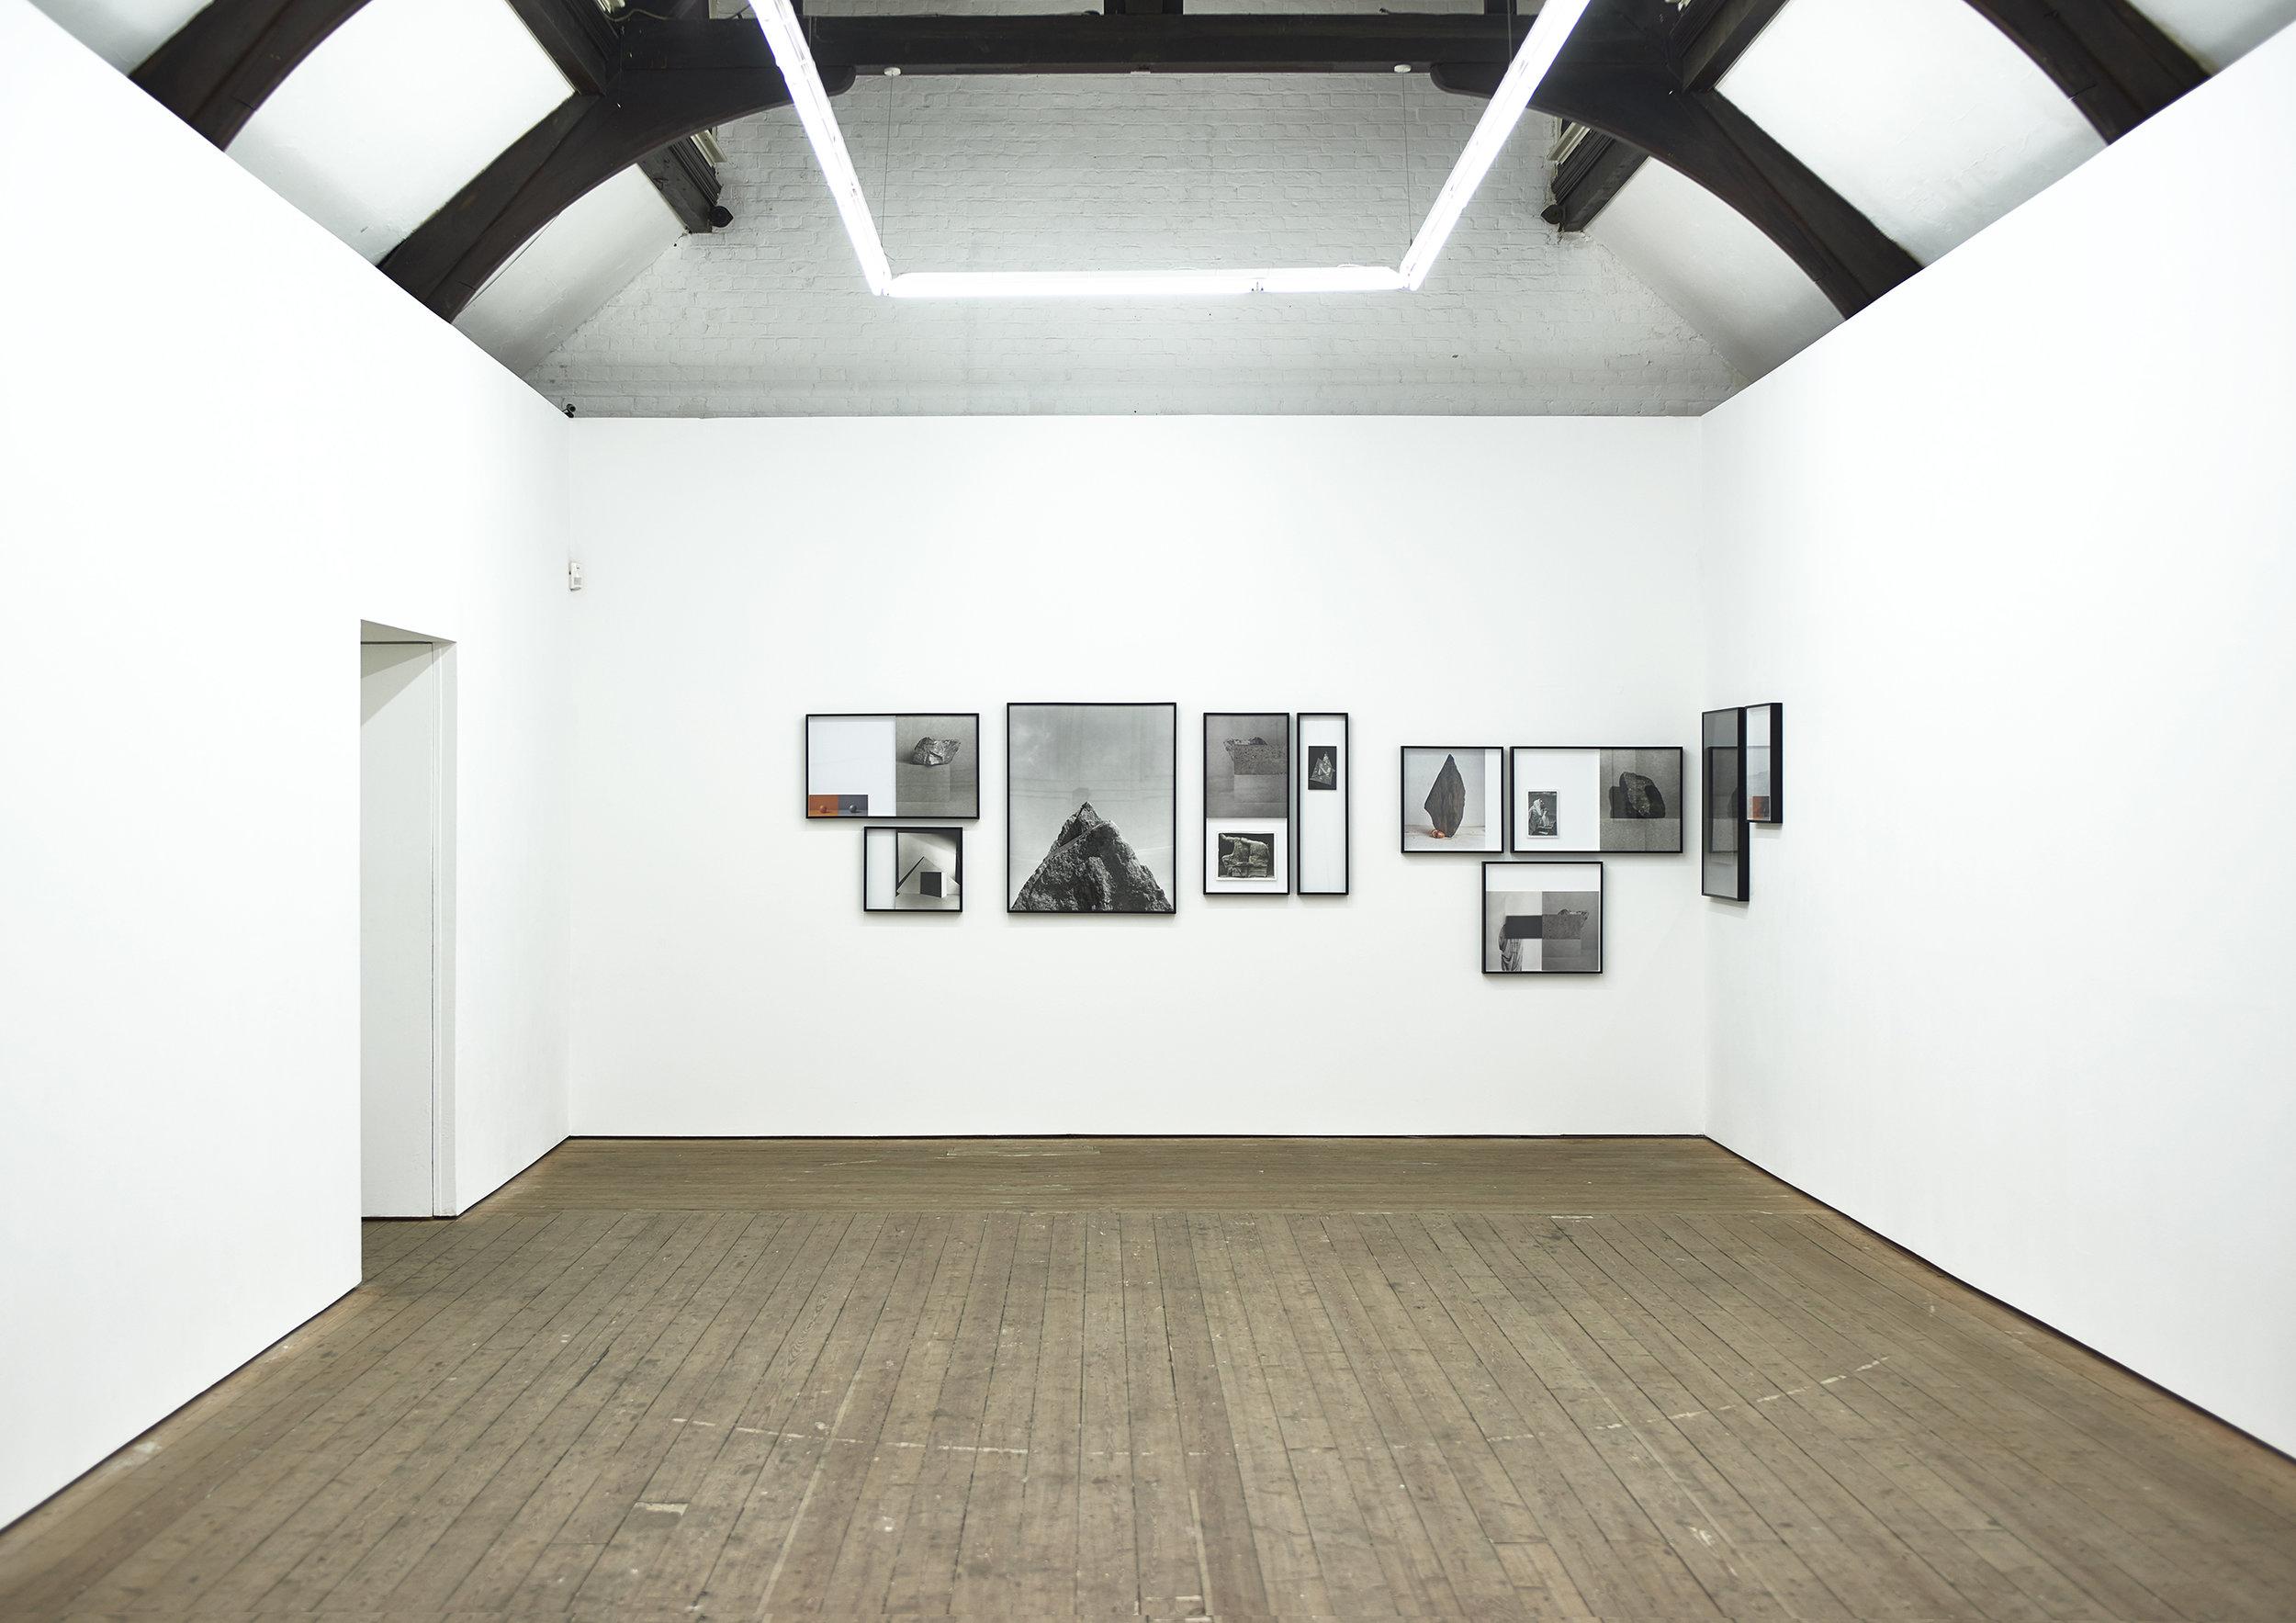 (M17 install 2) Metalepsis, installation view, Copperfield, London, 2017